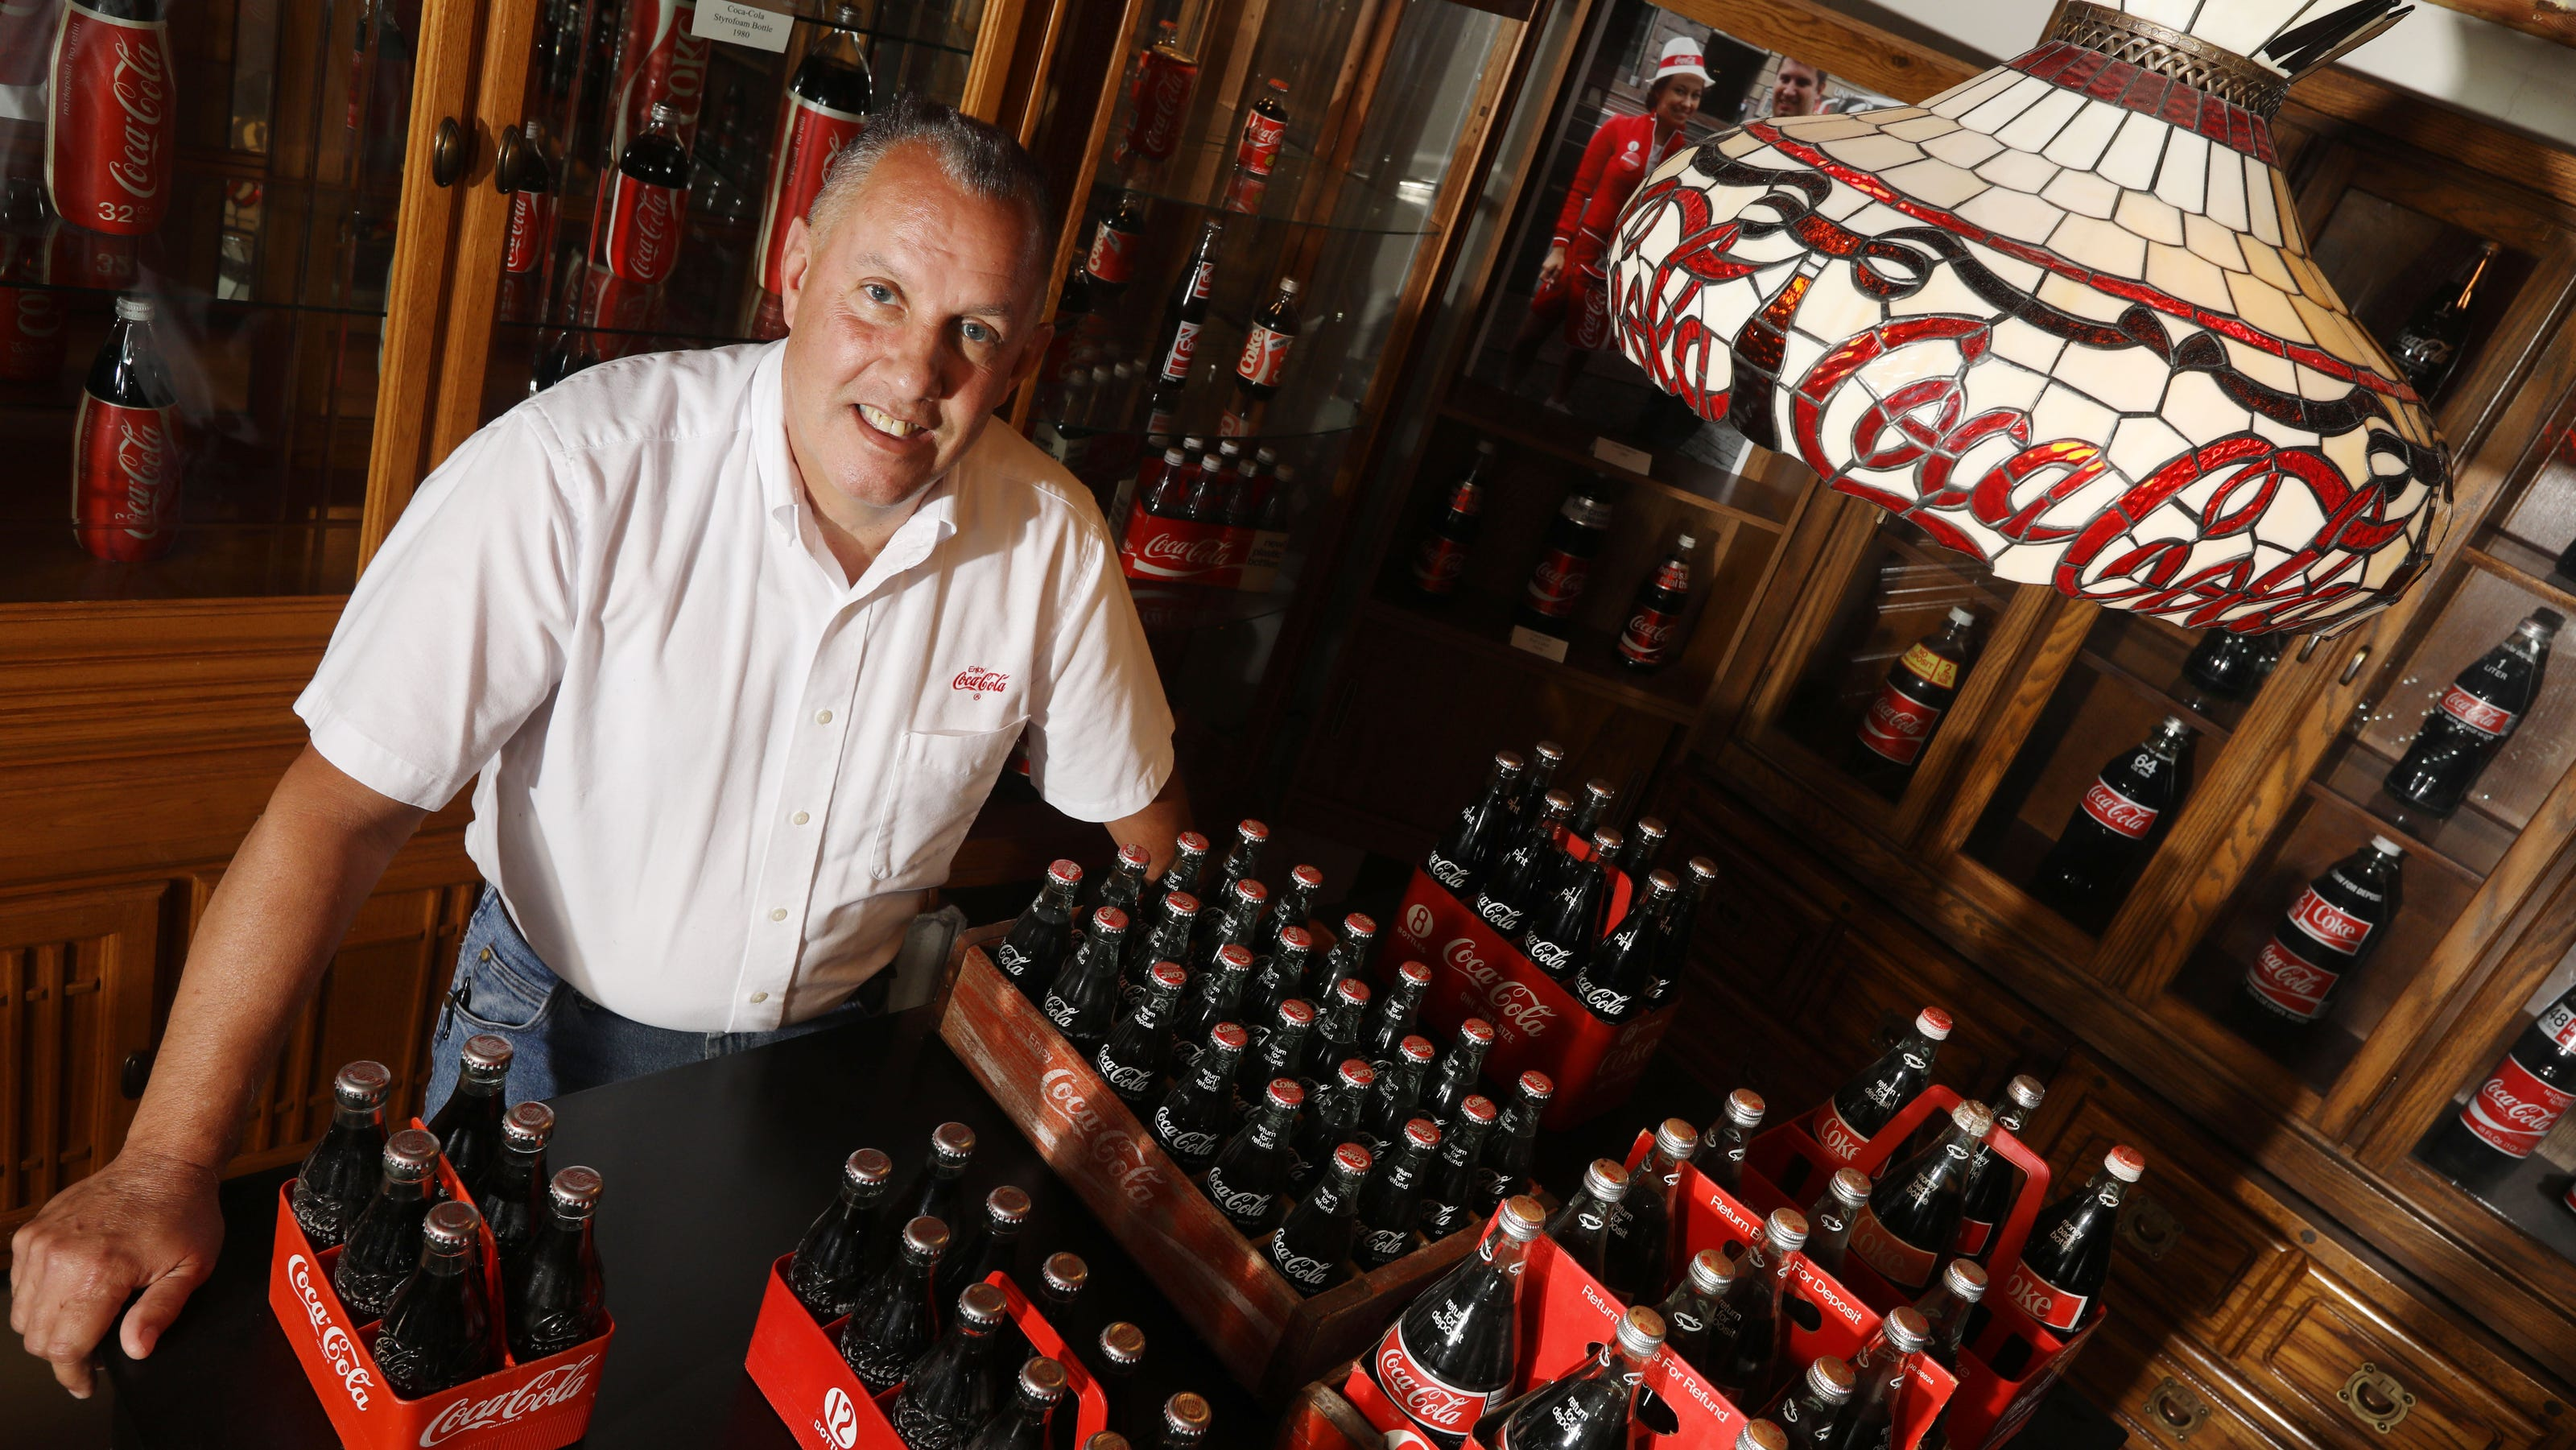 cb48b328 c92e 41b5 8f5f 248080becf14 FEA Coke Collector Jim Sonneville 1  jpg?crop=6719,3780,x0,y0&width=3200&height=1801&format=pjpg&auto=webp.